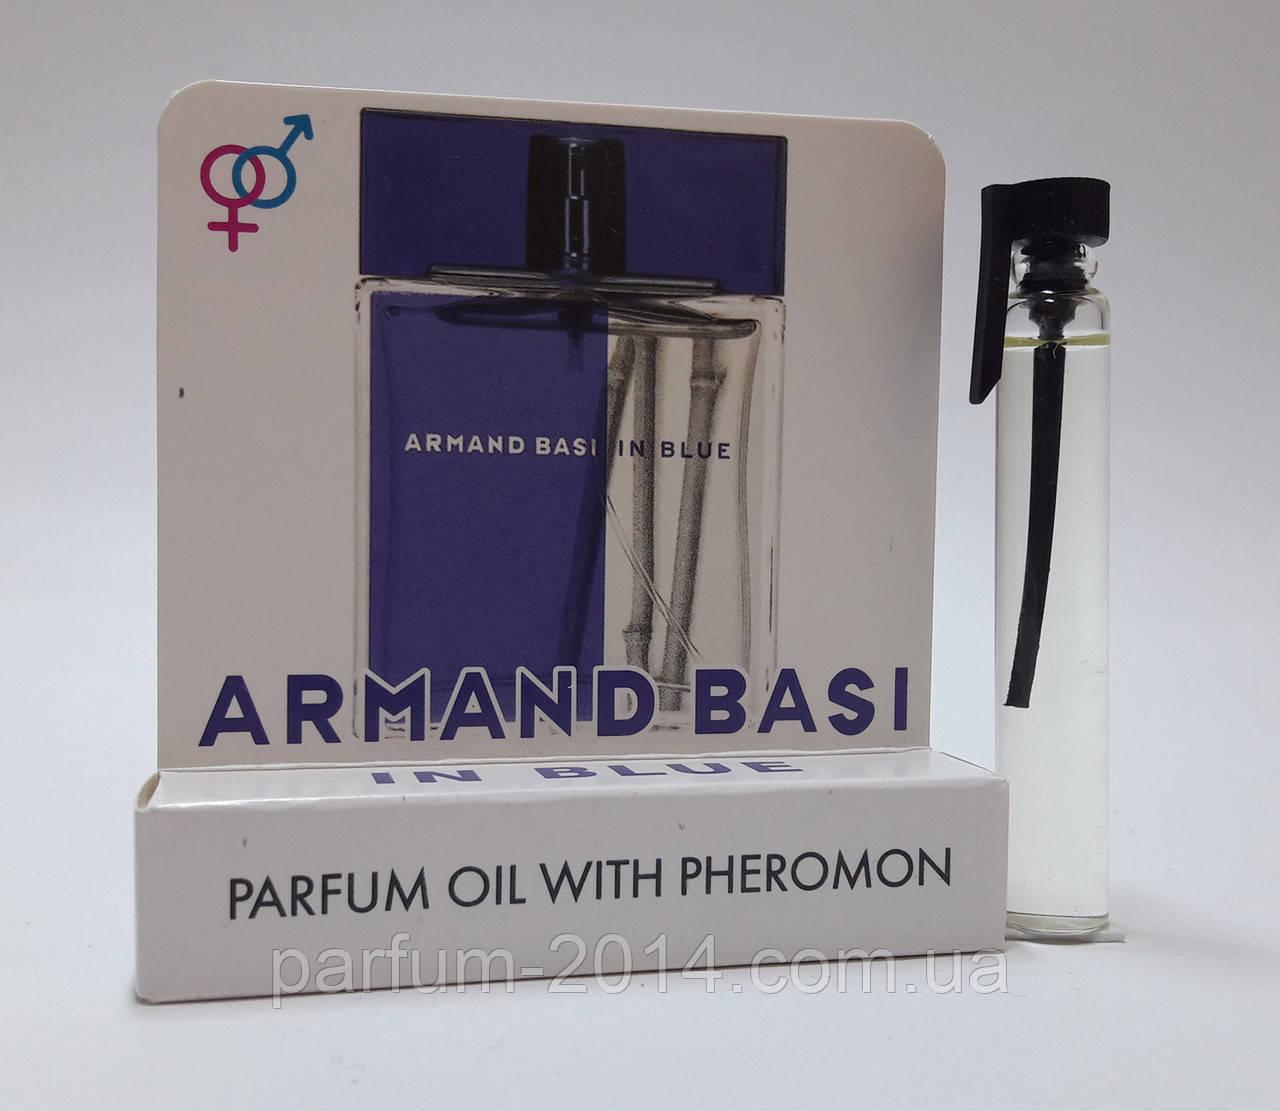 Масляные духи с феромонами Armand Basi in Blue 5 ml (реплика)